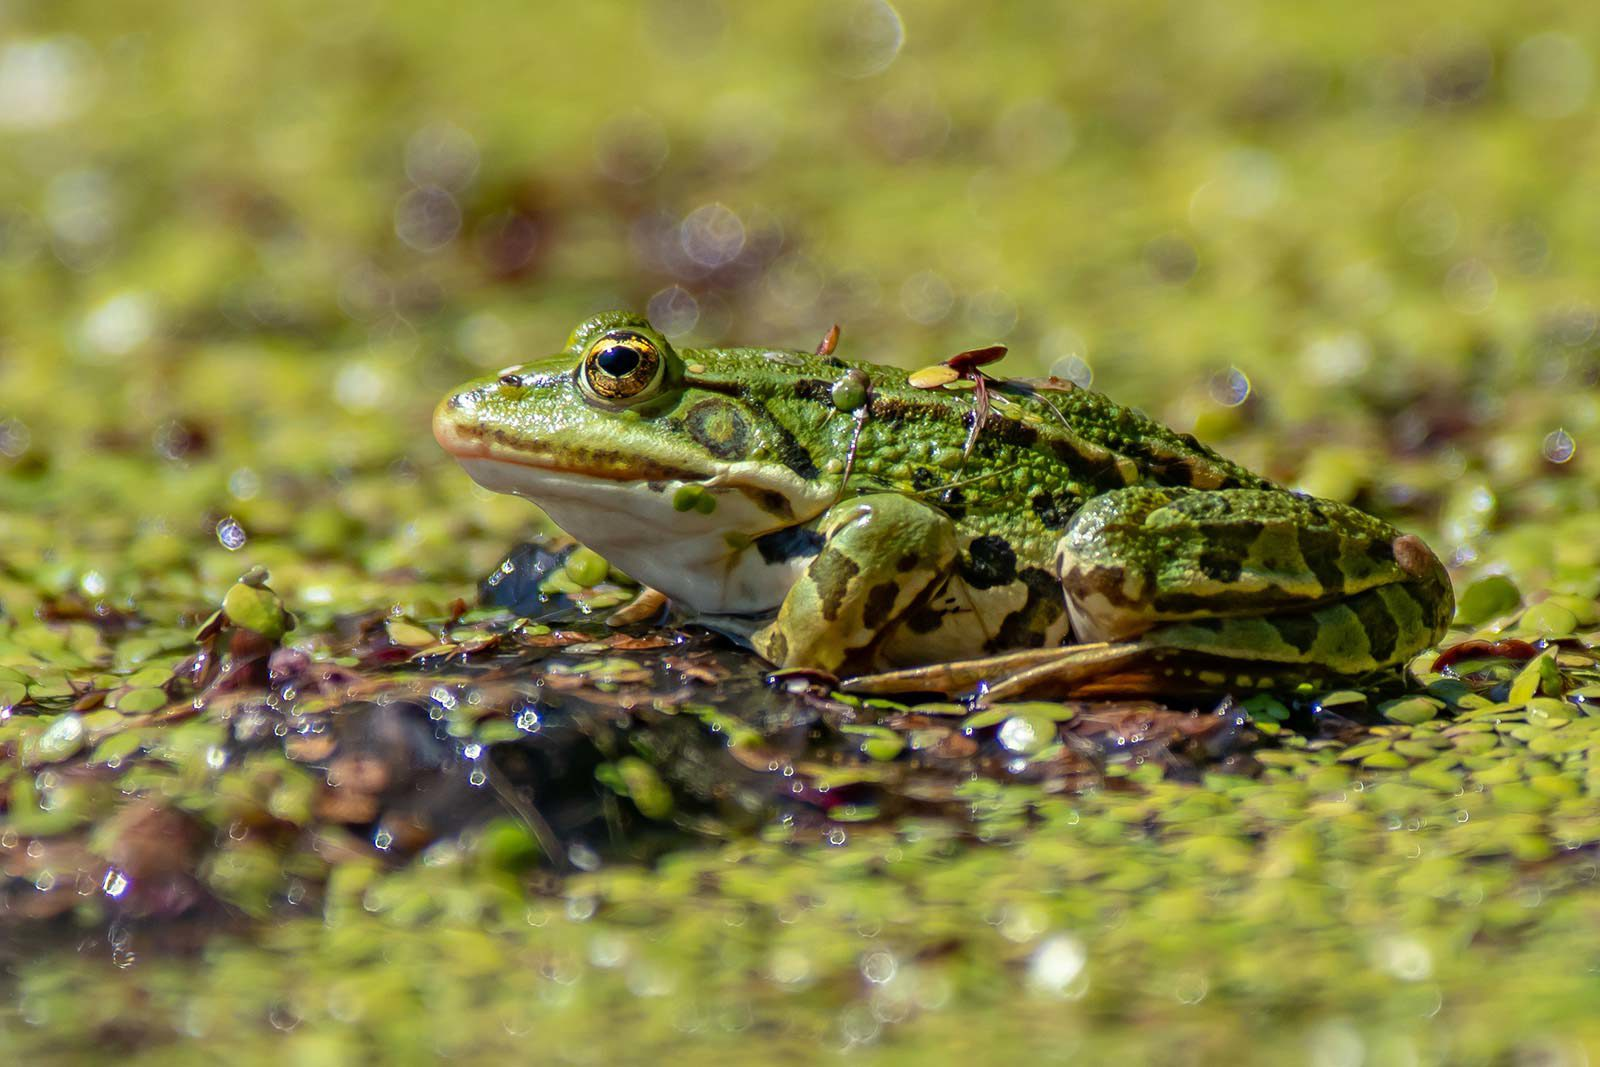 Green frog sitting on green vegetation.